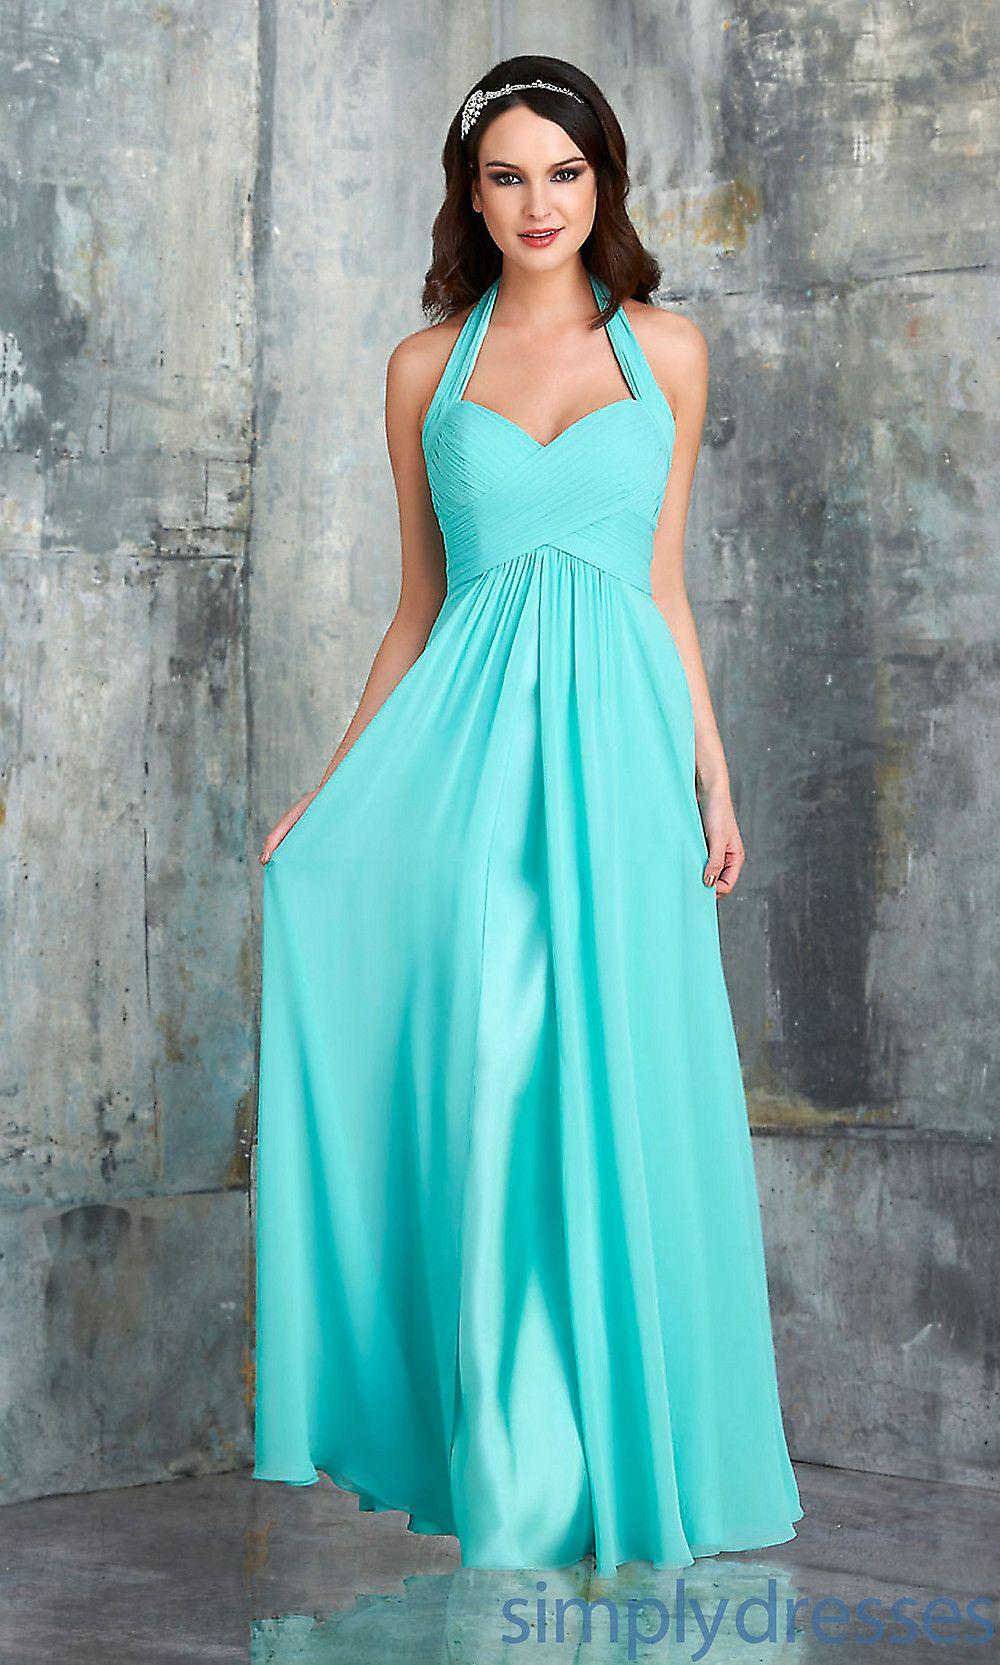 Dress, Criss Cross Halter Bridesmaid Dress by Bari Jay - Simply ...